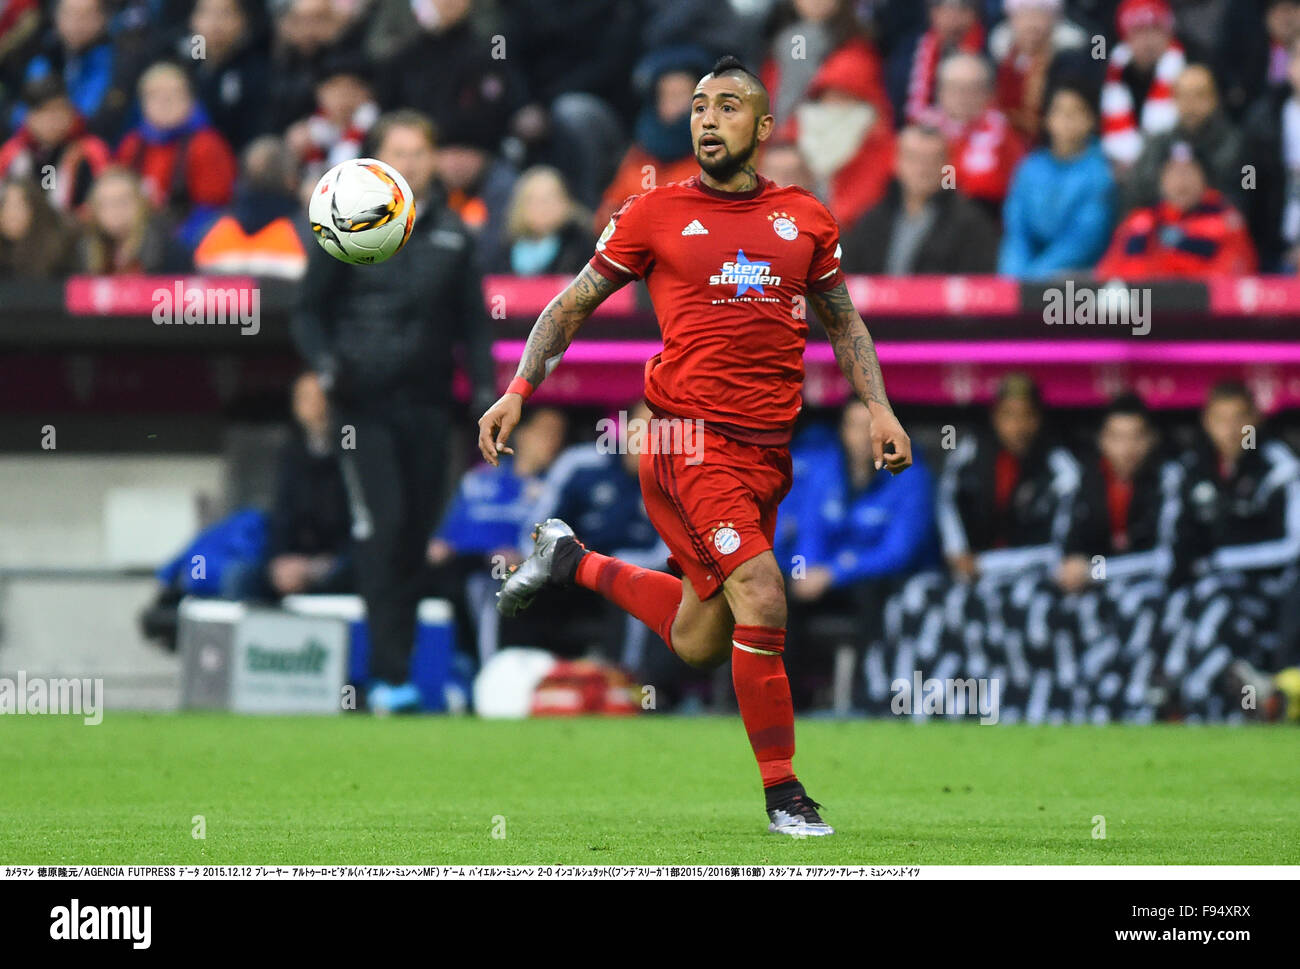 Arturo Vidal Bayern Stock Photos Arturo Vidal Bayern Stock Images